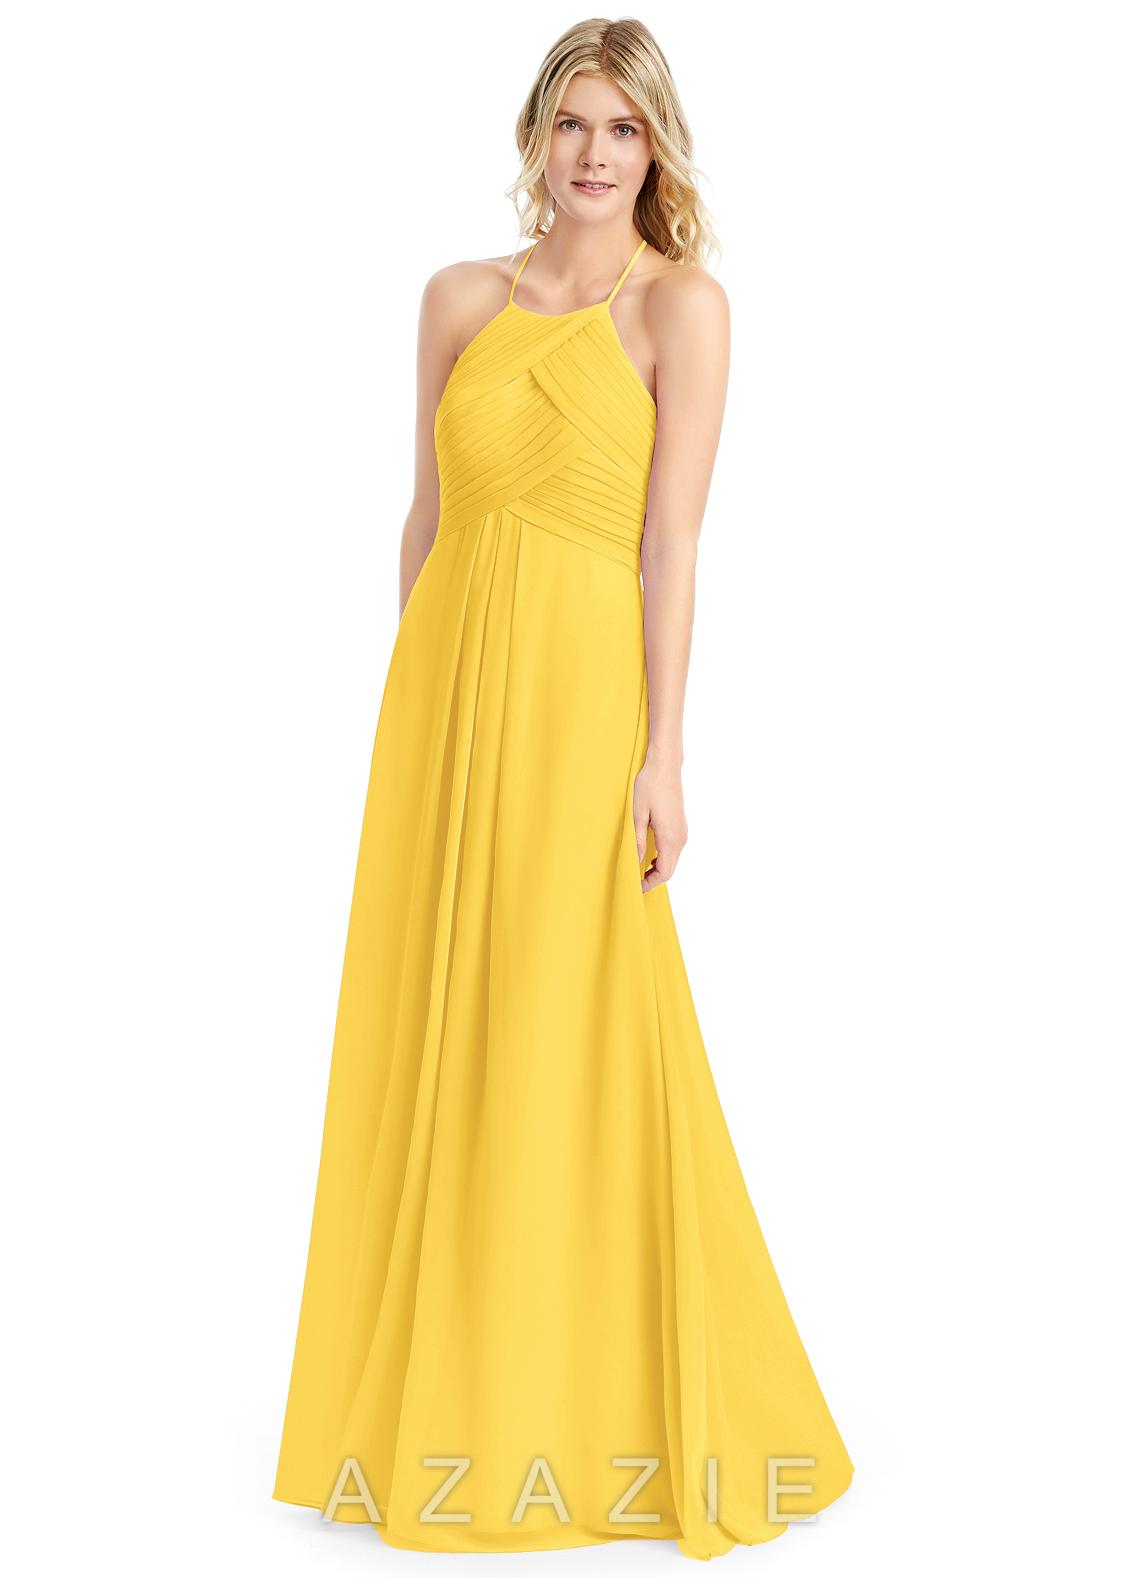 3598d59a9e7 Azazie Ginger Bridesmaid Dress - Marigold